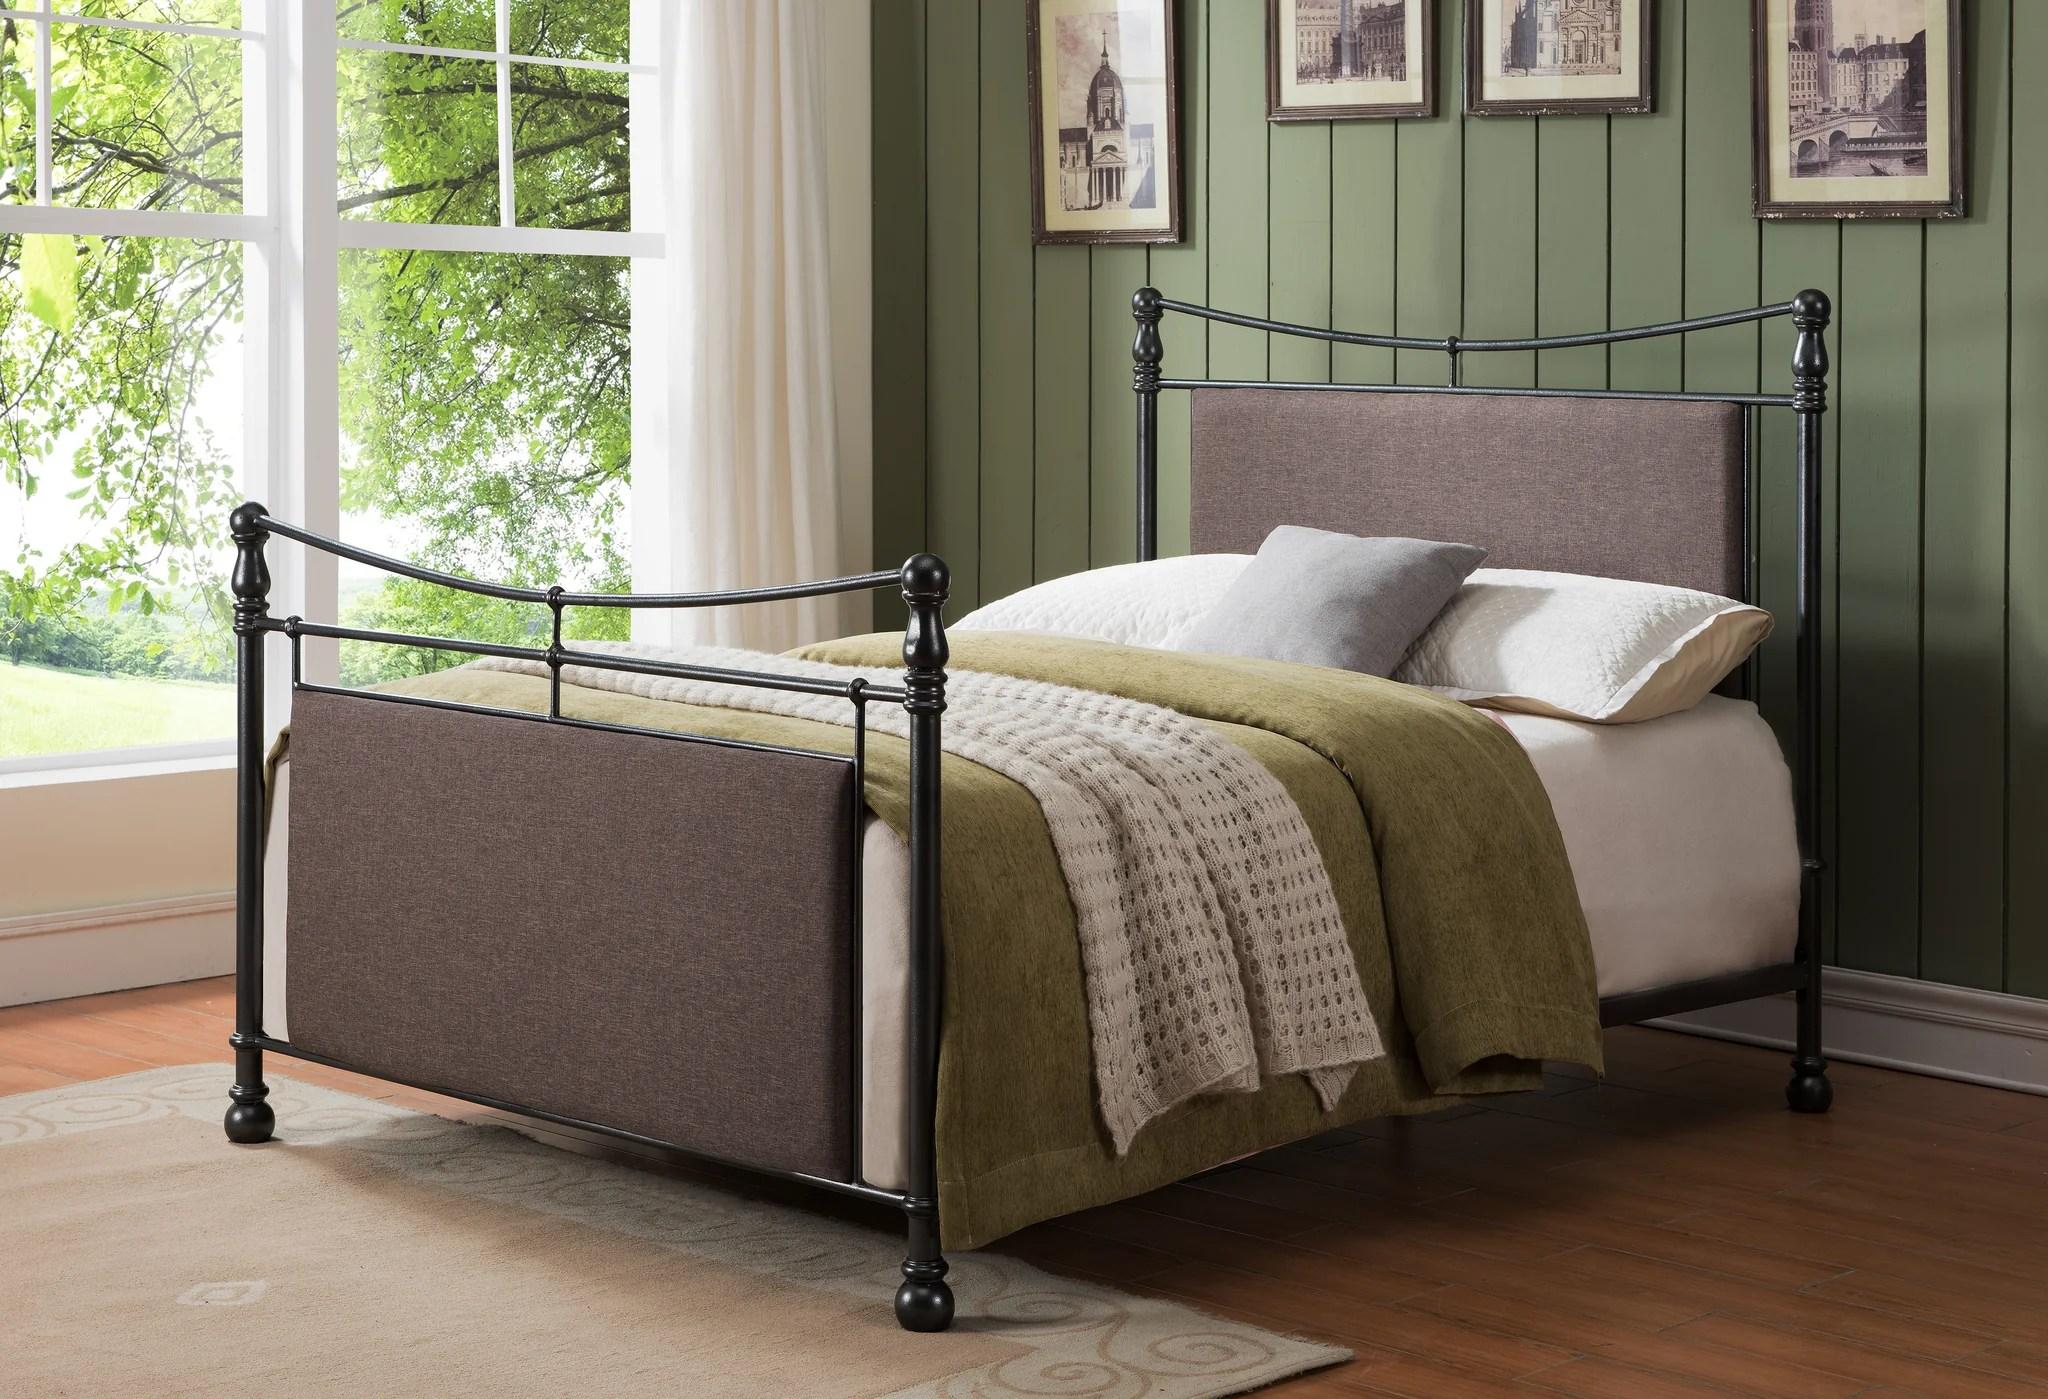 Warren Pewter Brown Upholstered Fabric Metal Bed